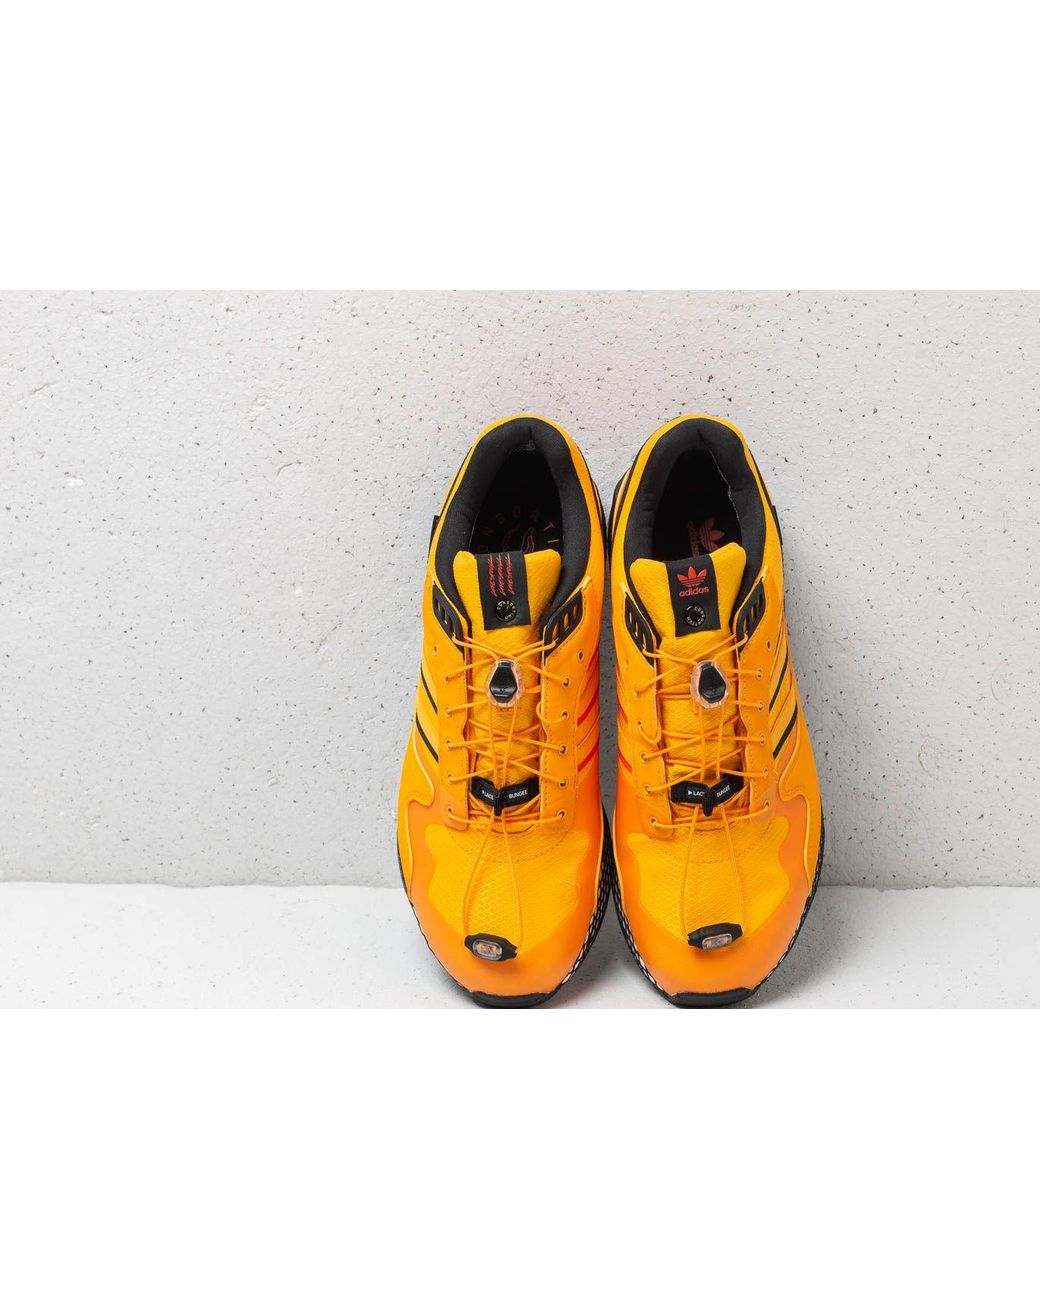 89e3c903959d9 Lyst - adidas Originals X Ultra Tech Gtx Livestock Yellow  Yellow  Core  Black in Red for Men